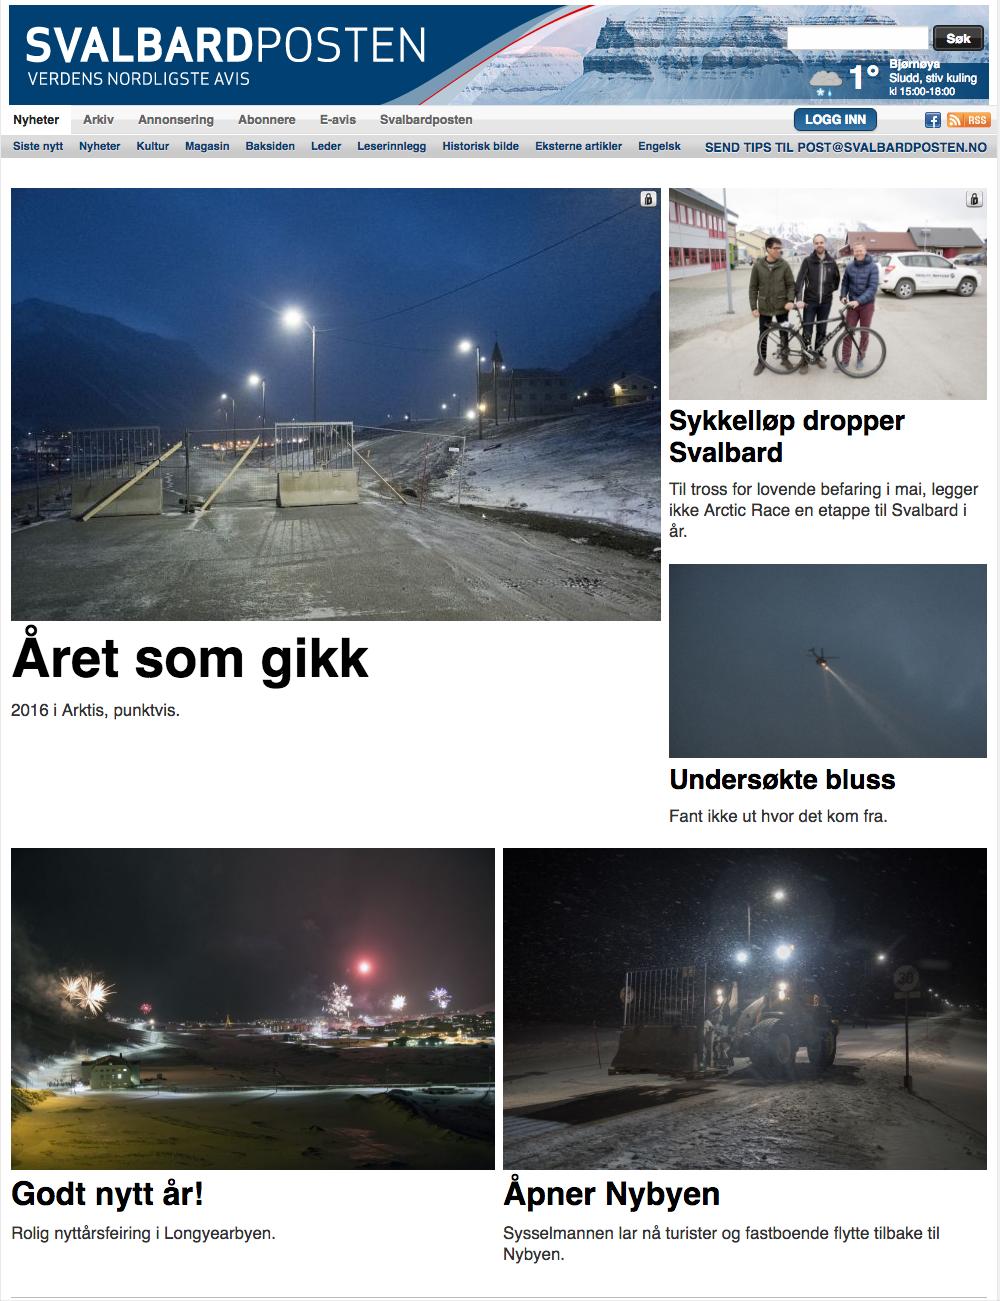 Svalbardposten